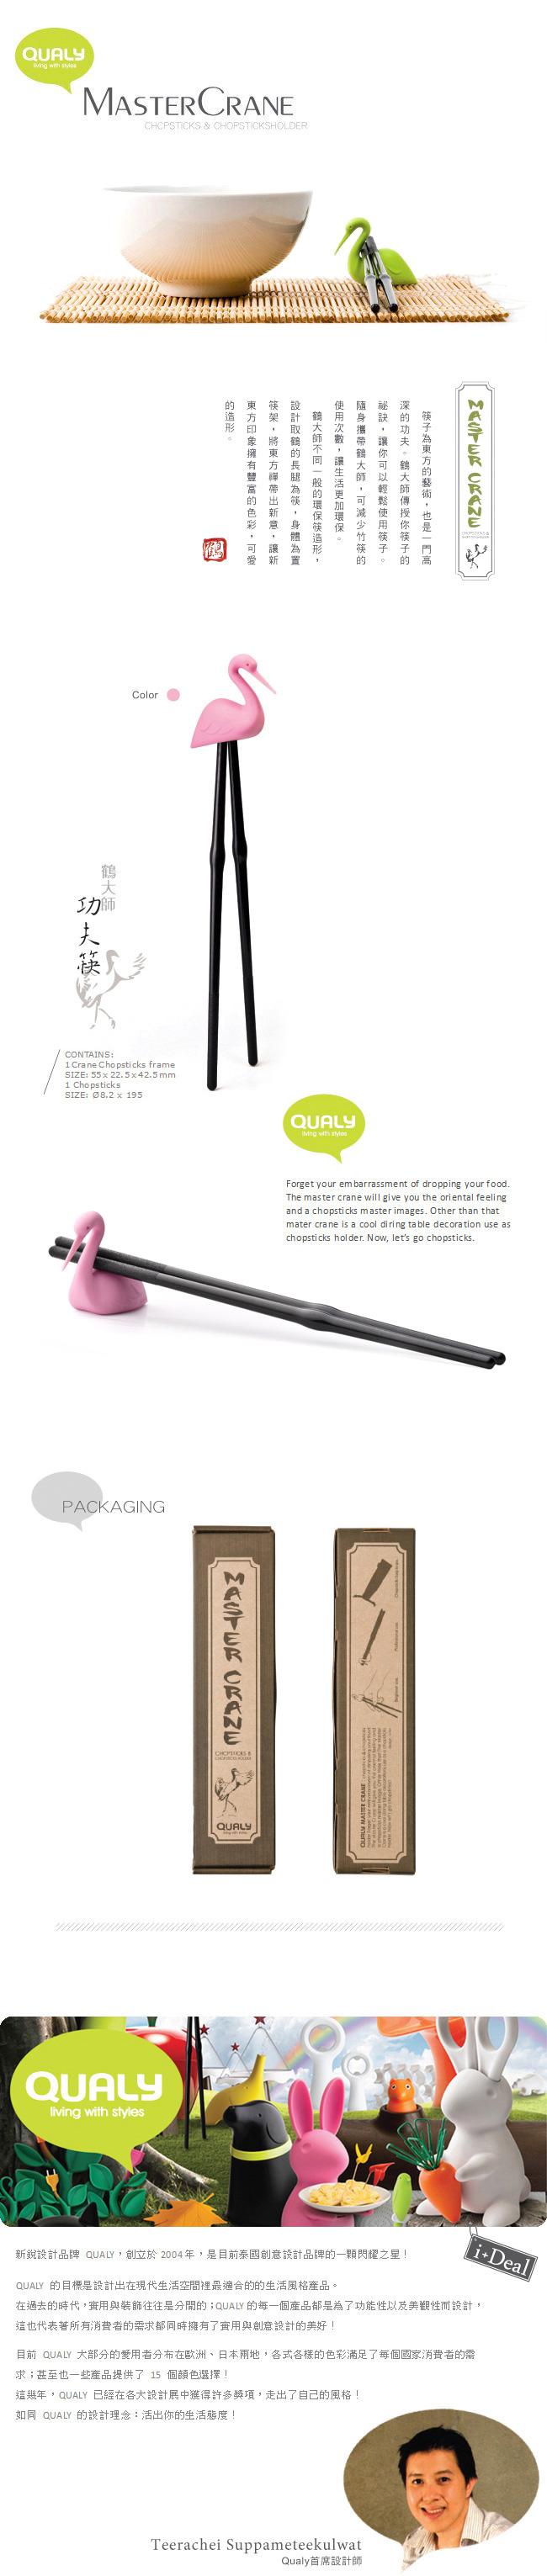 【FINAL CALL】QUALY 鶴大師功夫筷 Master Crane/Chopsticks+Chopsticks Holder